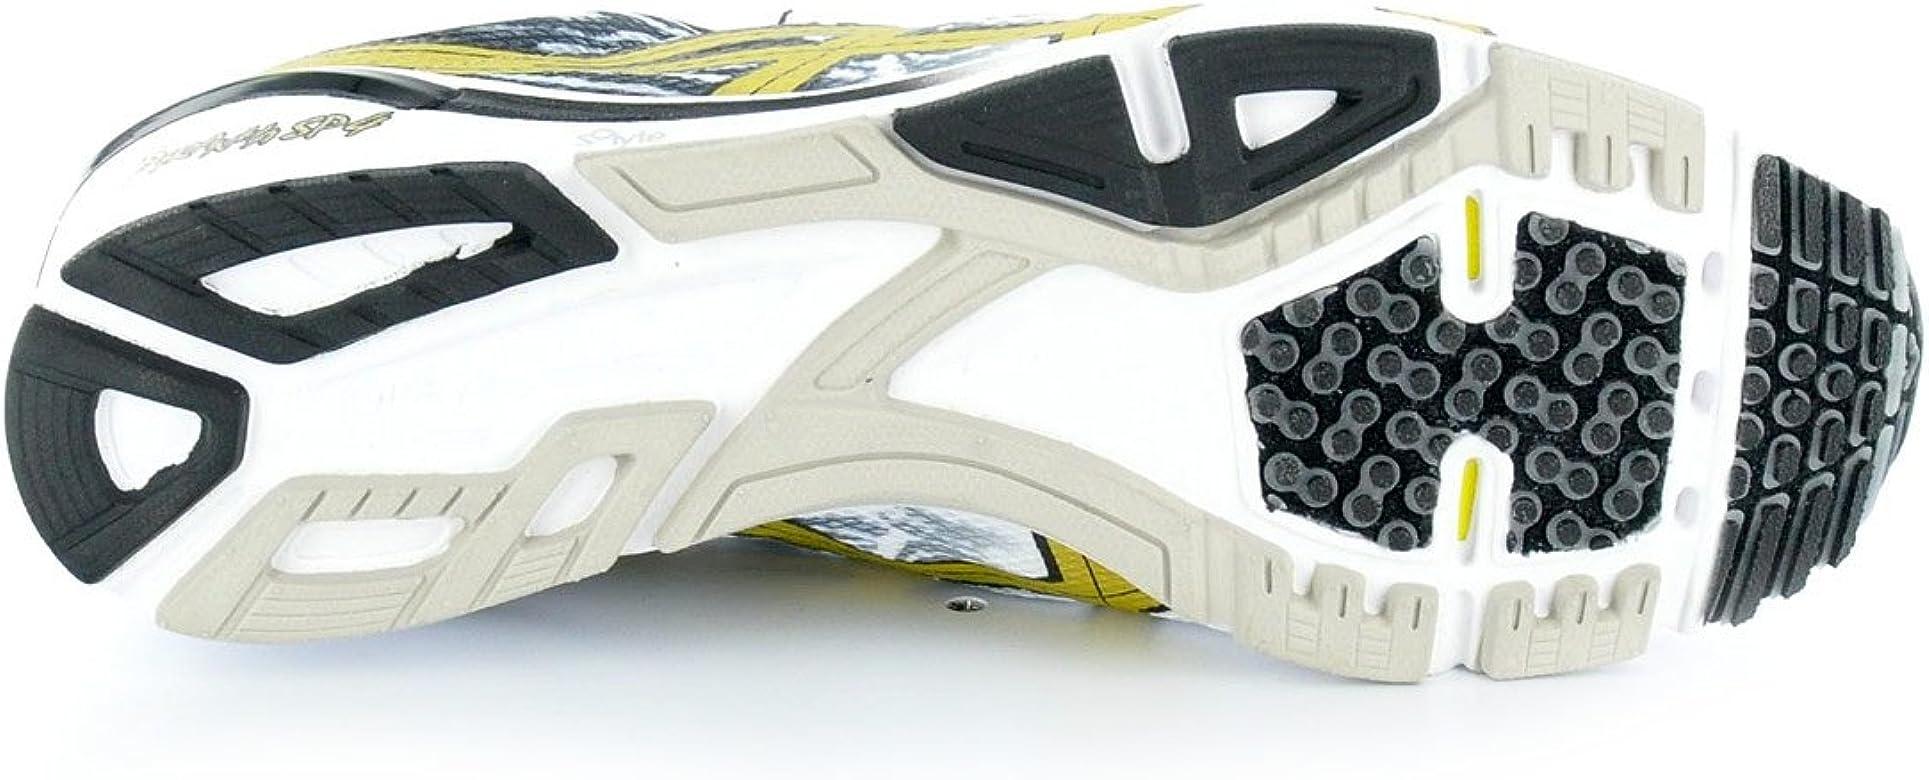 ASICS Piranha SP 4 Zapatilla de Running Caballero, Blanco/Negro/Oro, 40.5: Amazon.es: Zapatos y complementos